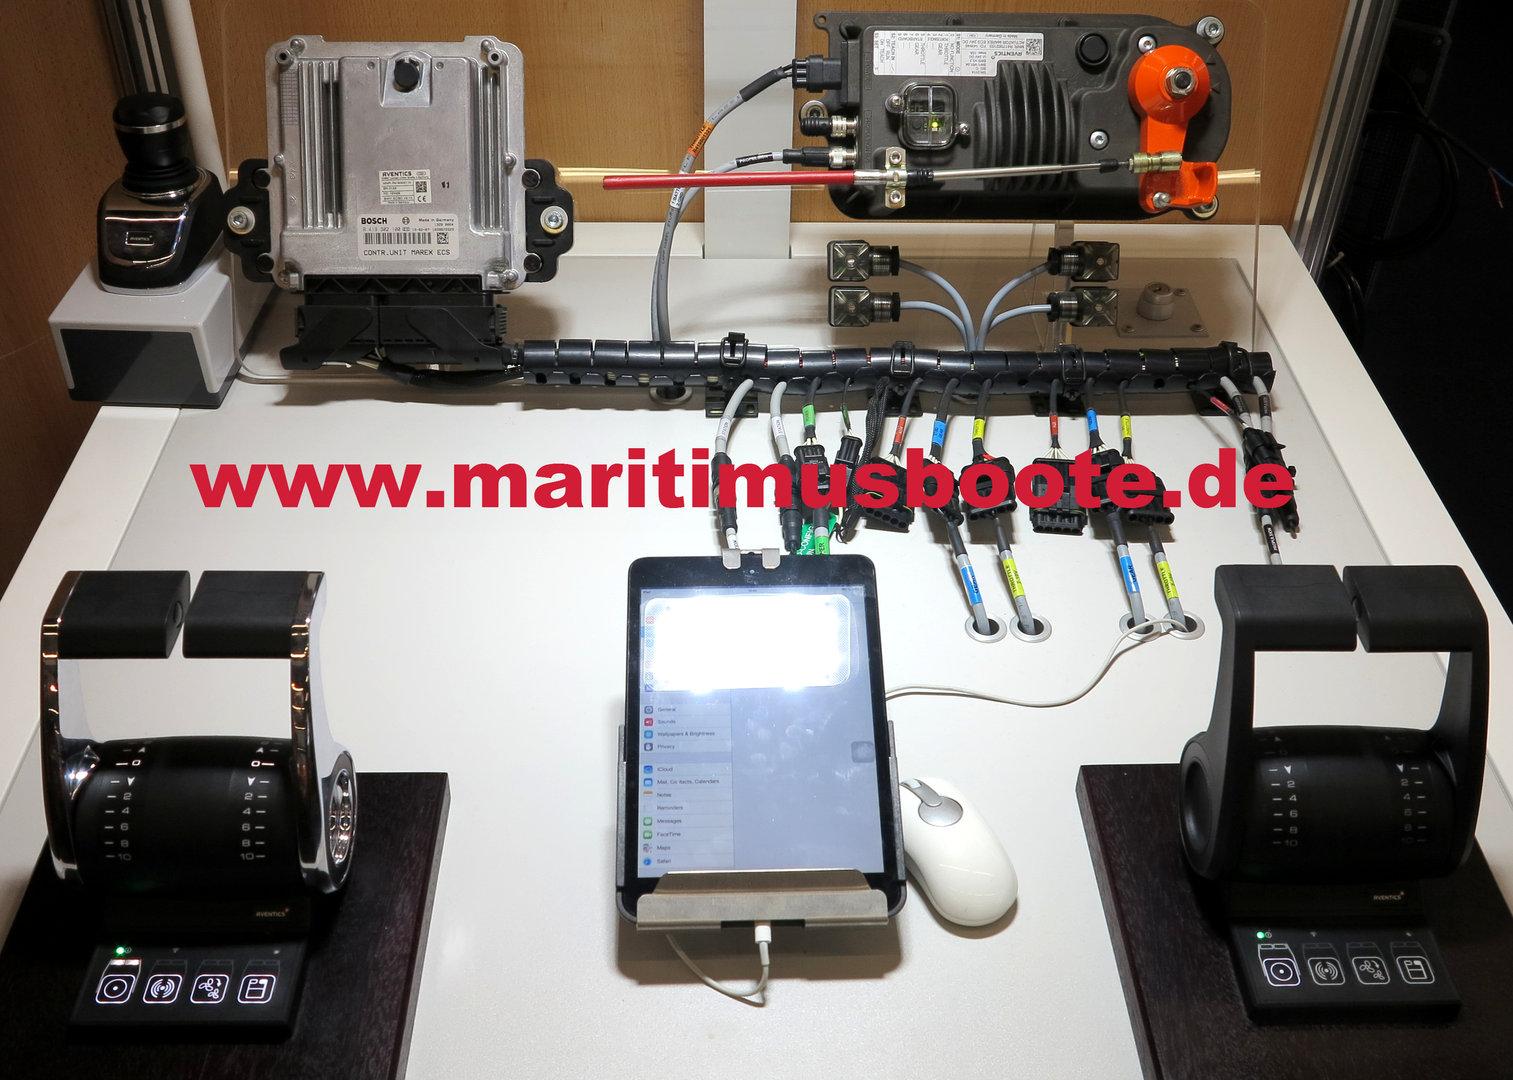 Bosch Rexroth Aventics Marex Ecs Wiring Harness Twin Table